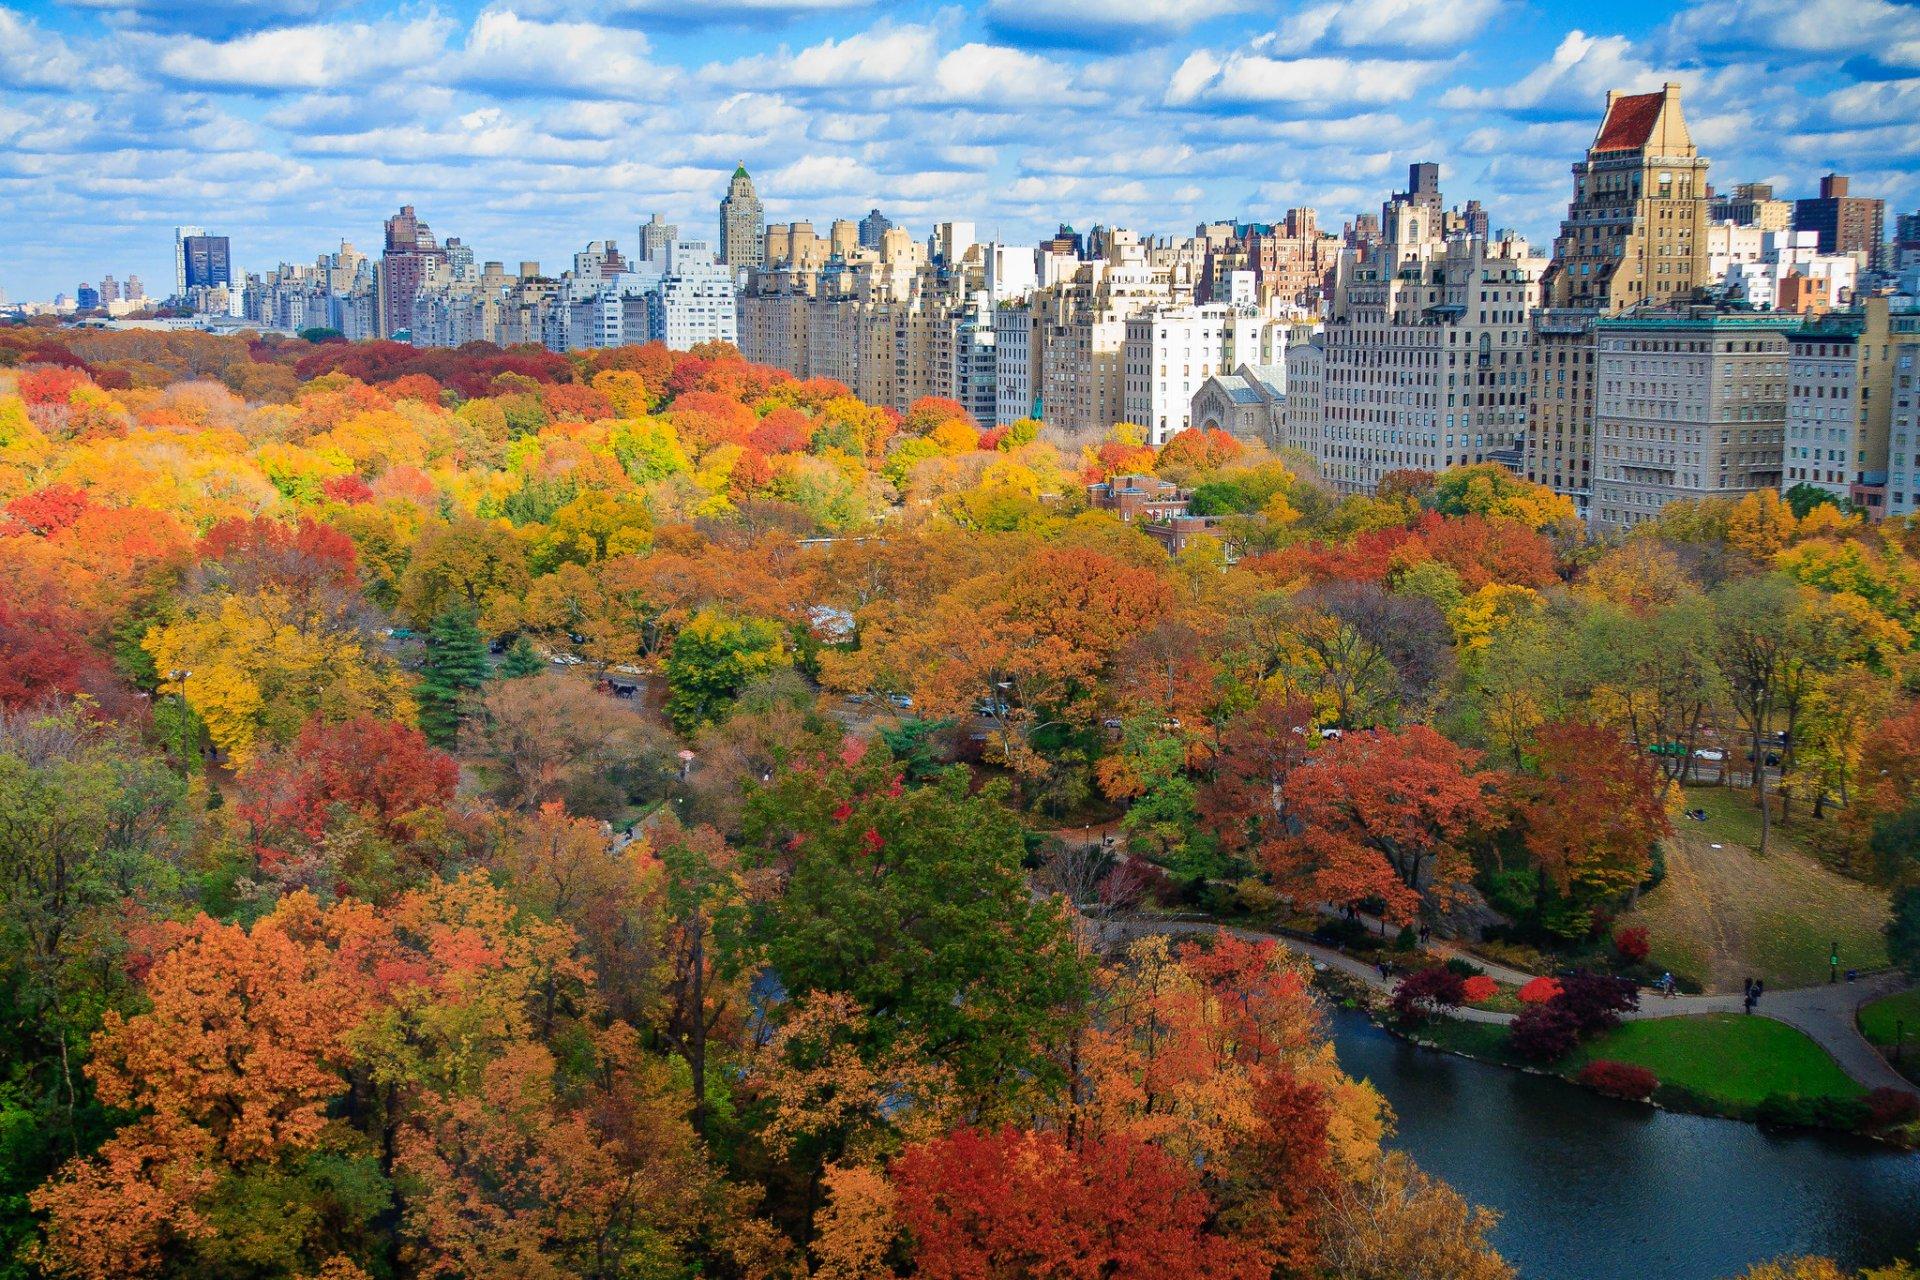 NYC Herbstlaub in New York City NYC, 21